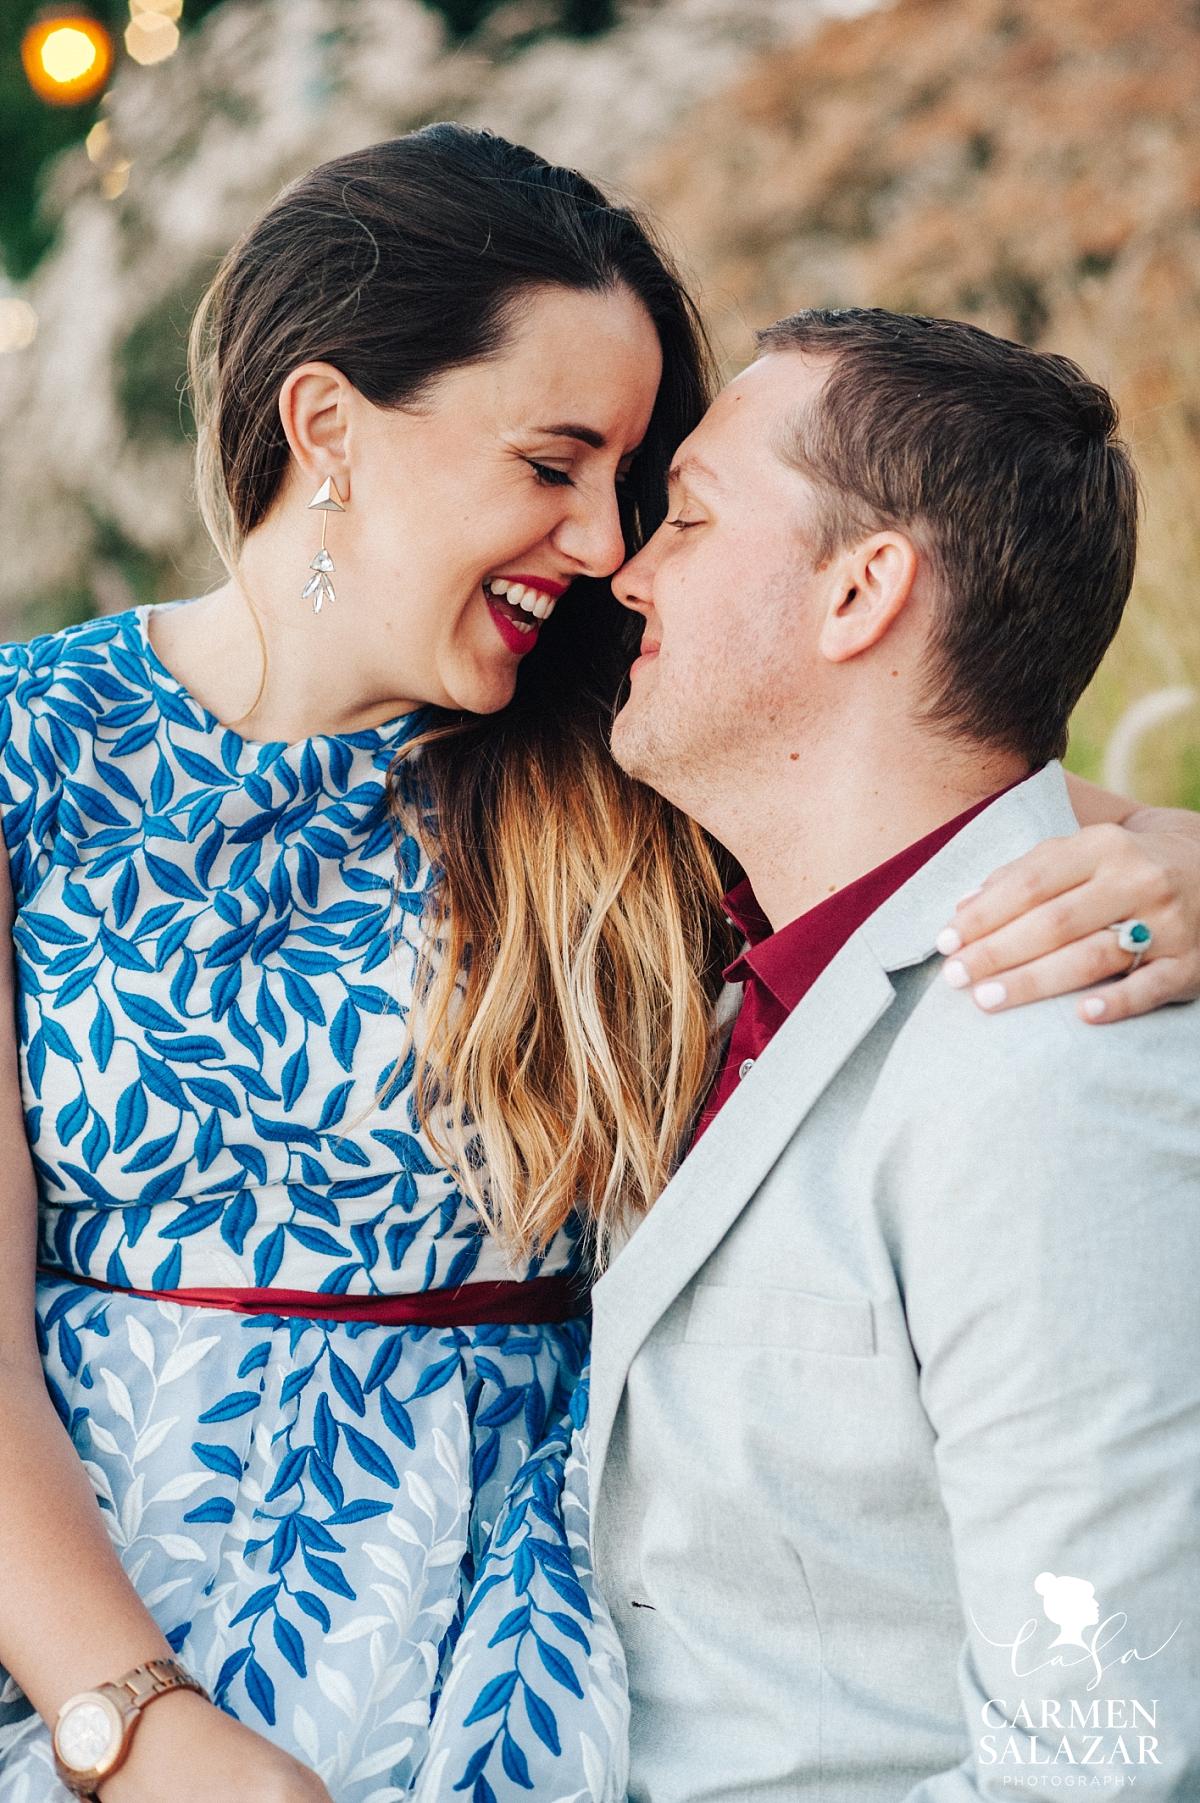 Sunset Bay Area Engagement Portraits - Carmen Salazar